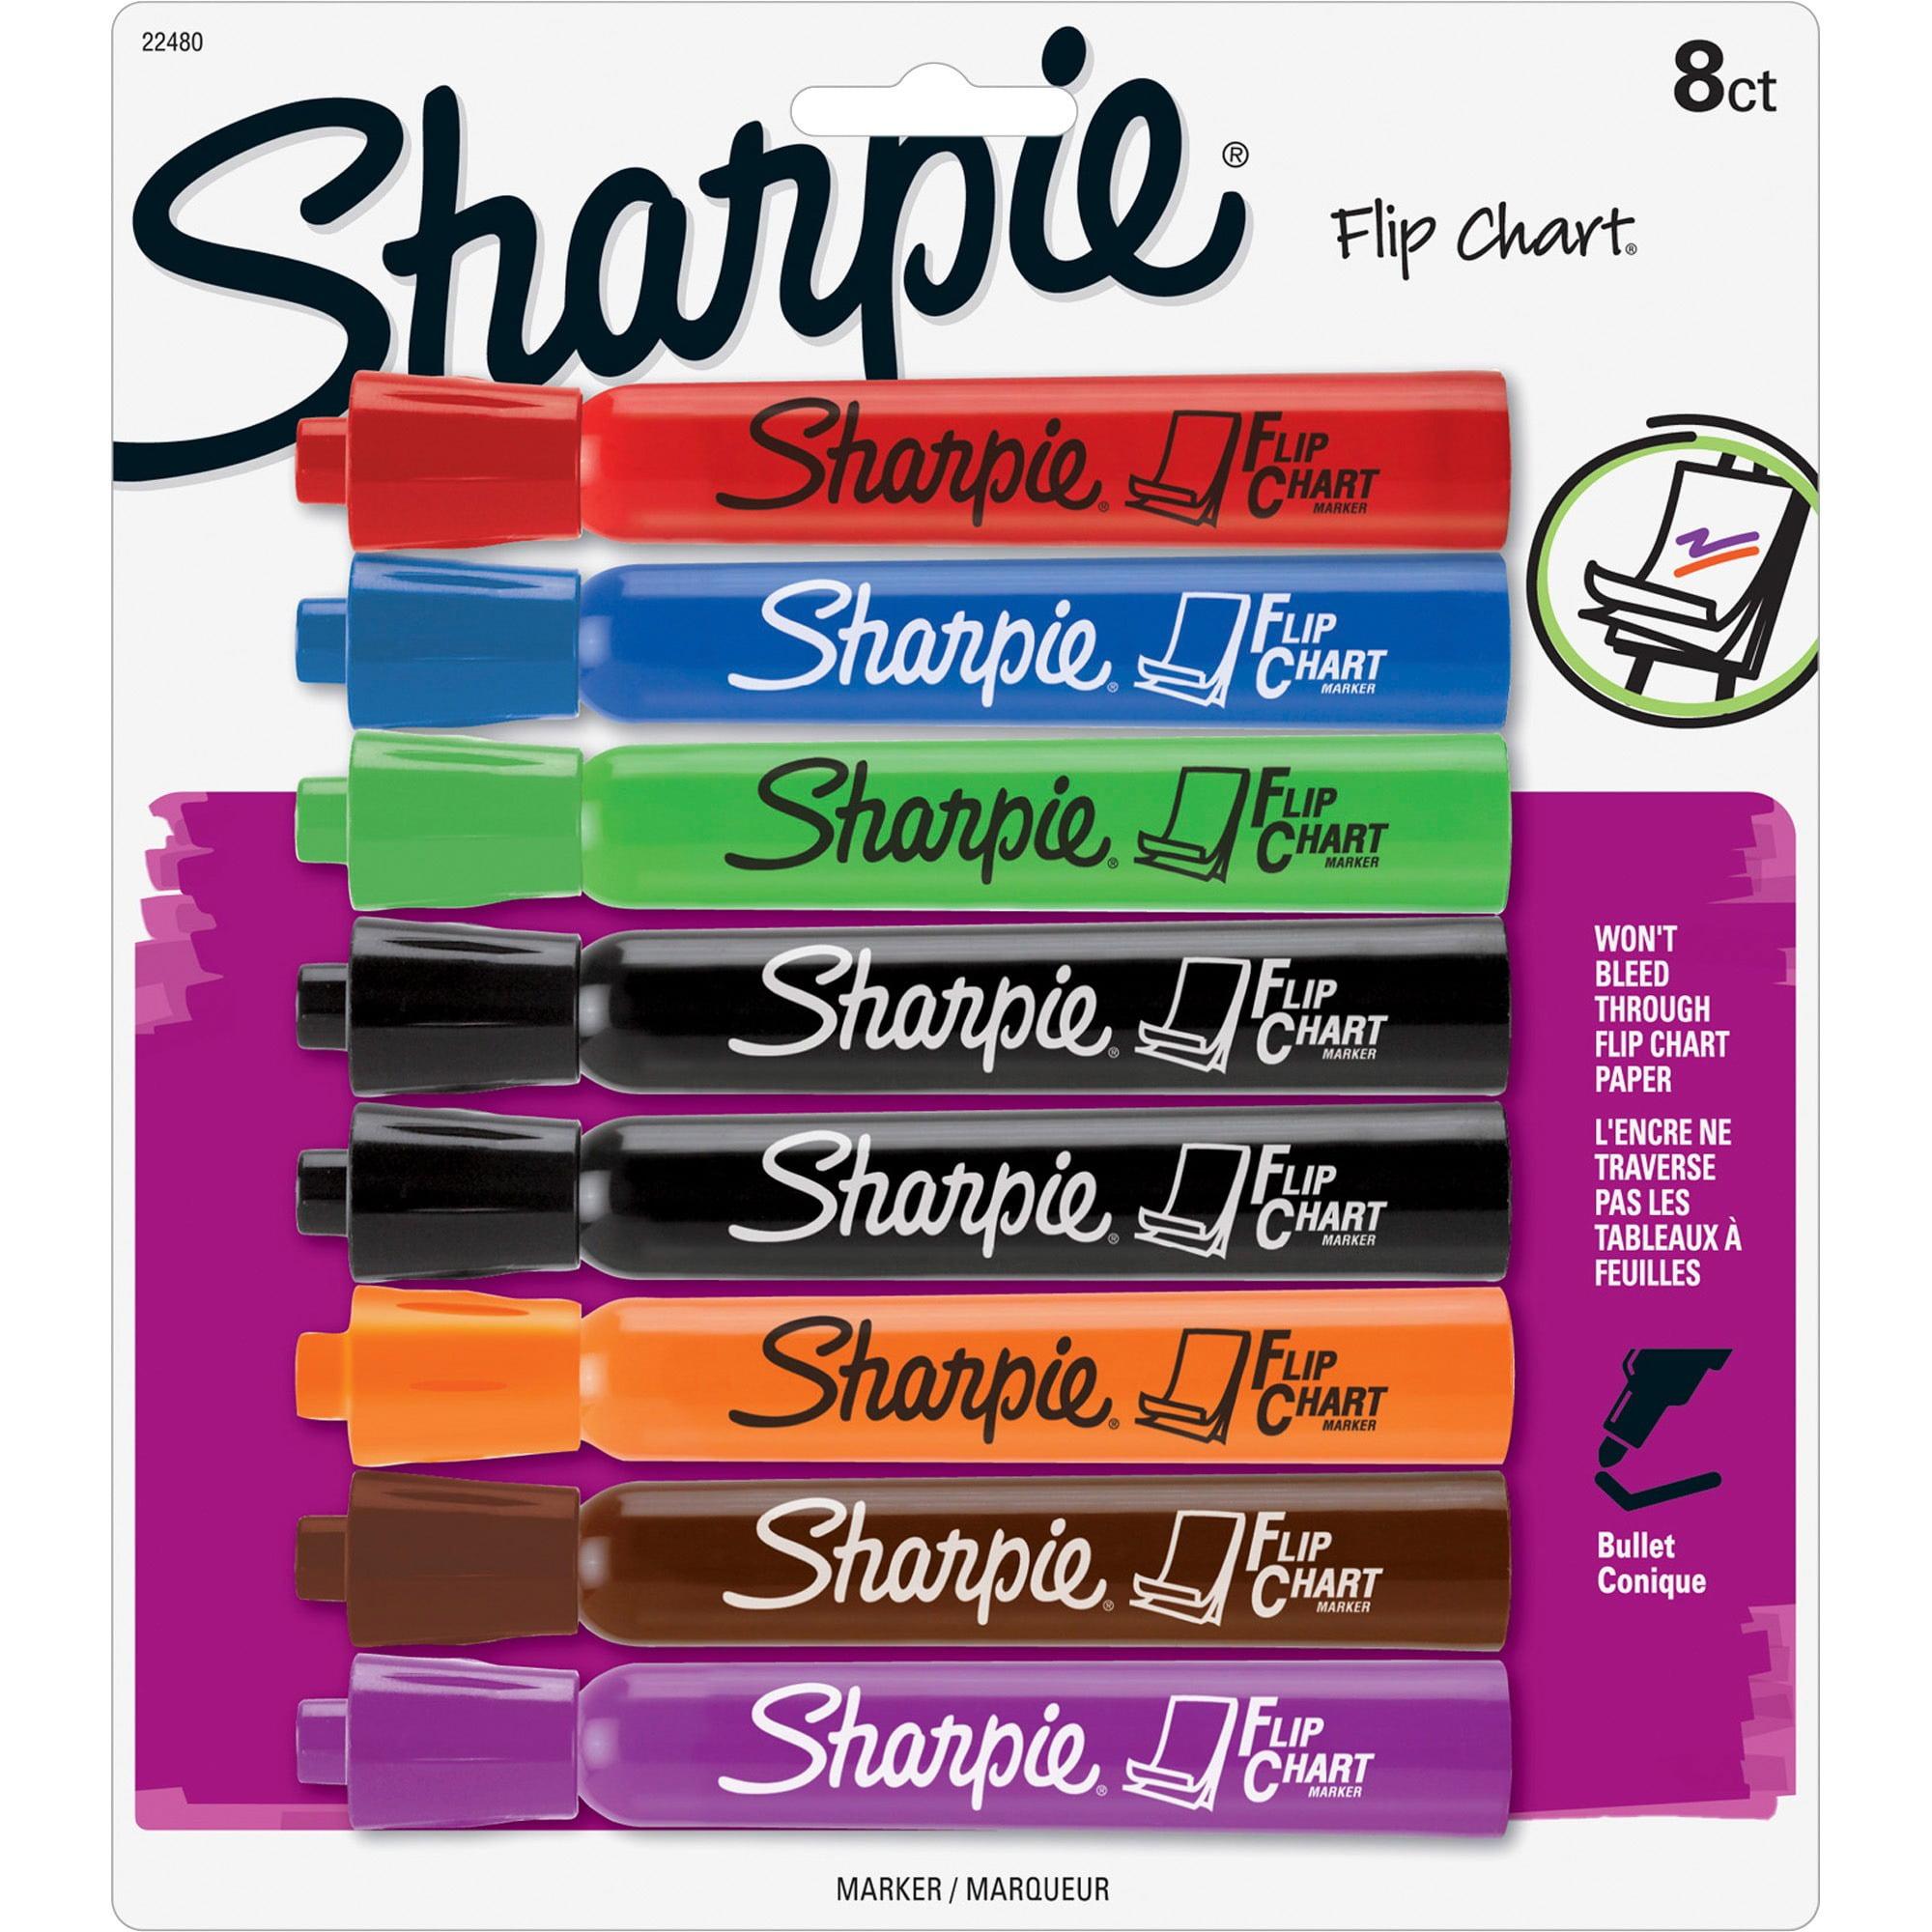 Picture A Christmas Flipchart.Sharpie Flip Chart Markers Bullet Tip Assorted Colors 8 Pack Walmart Com